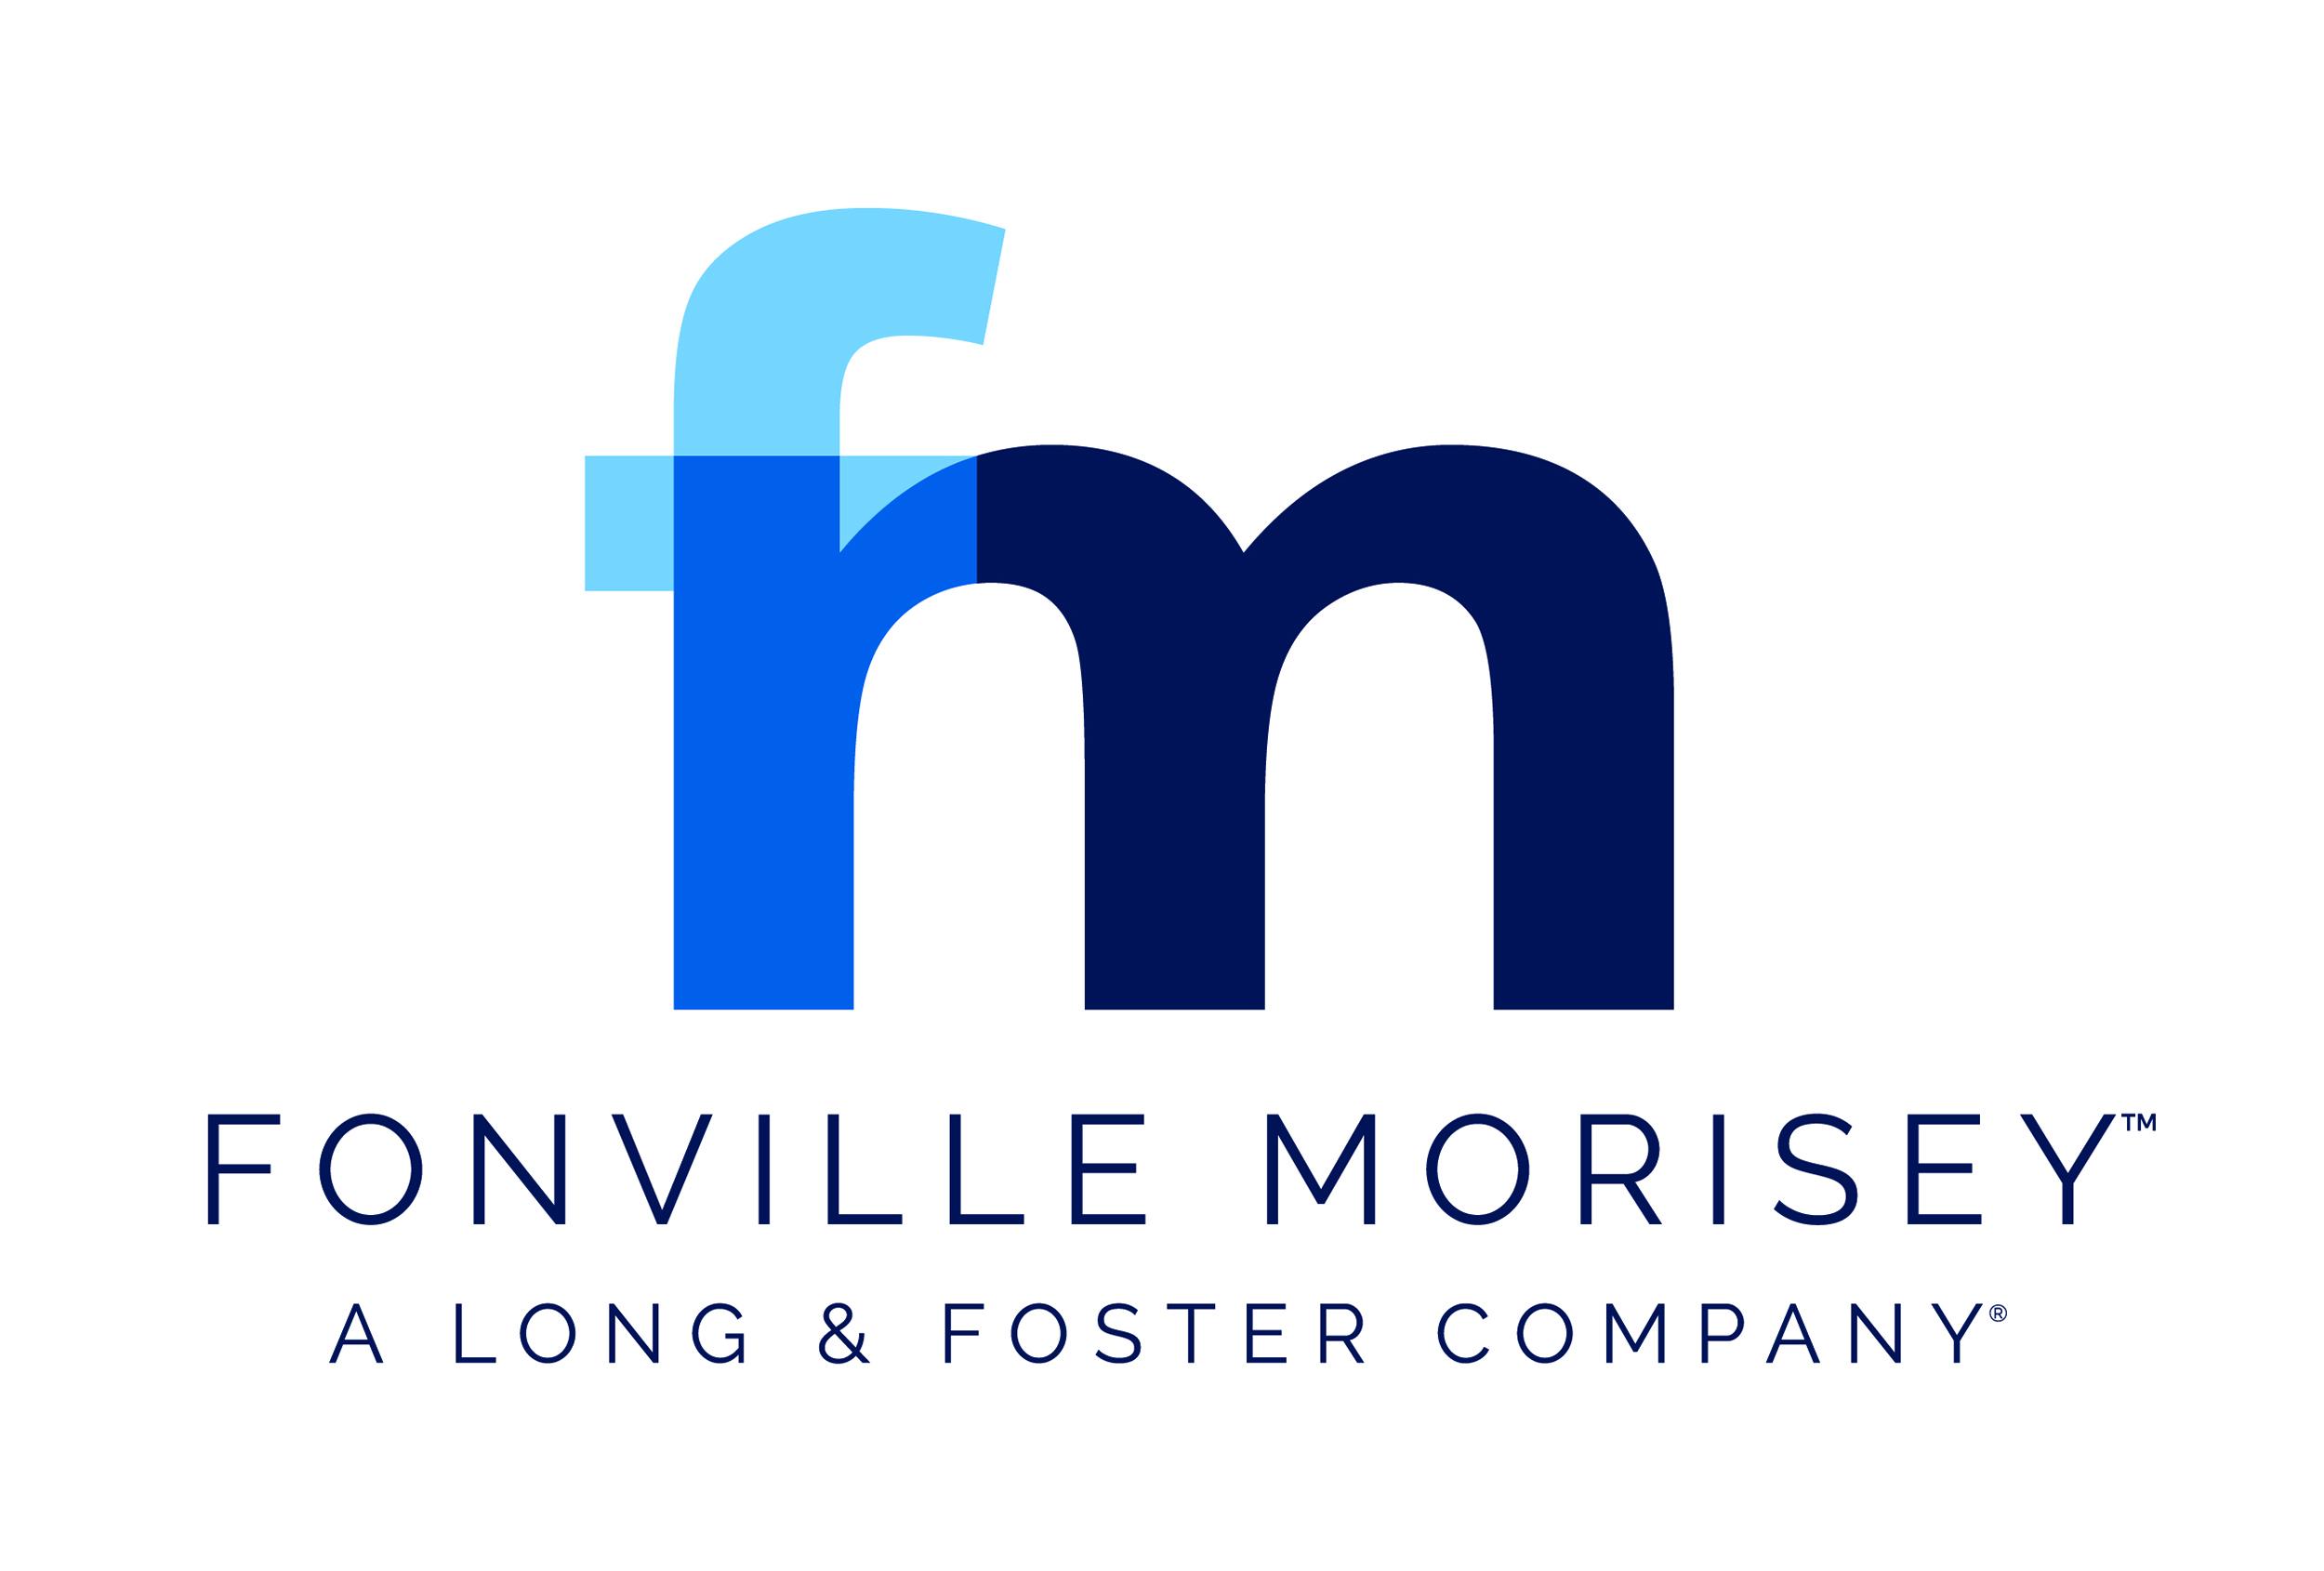 Linda Garner - Fonville Morisey